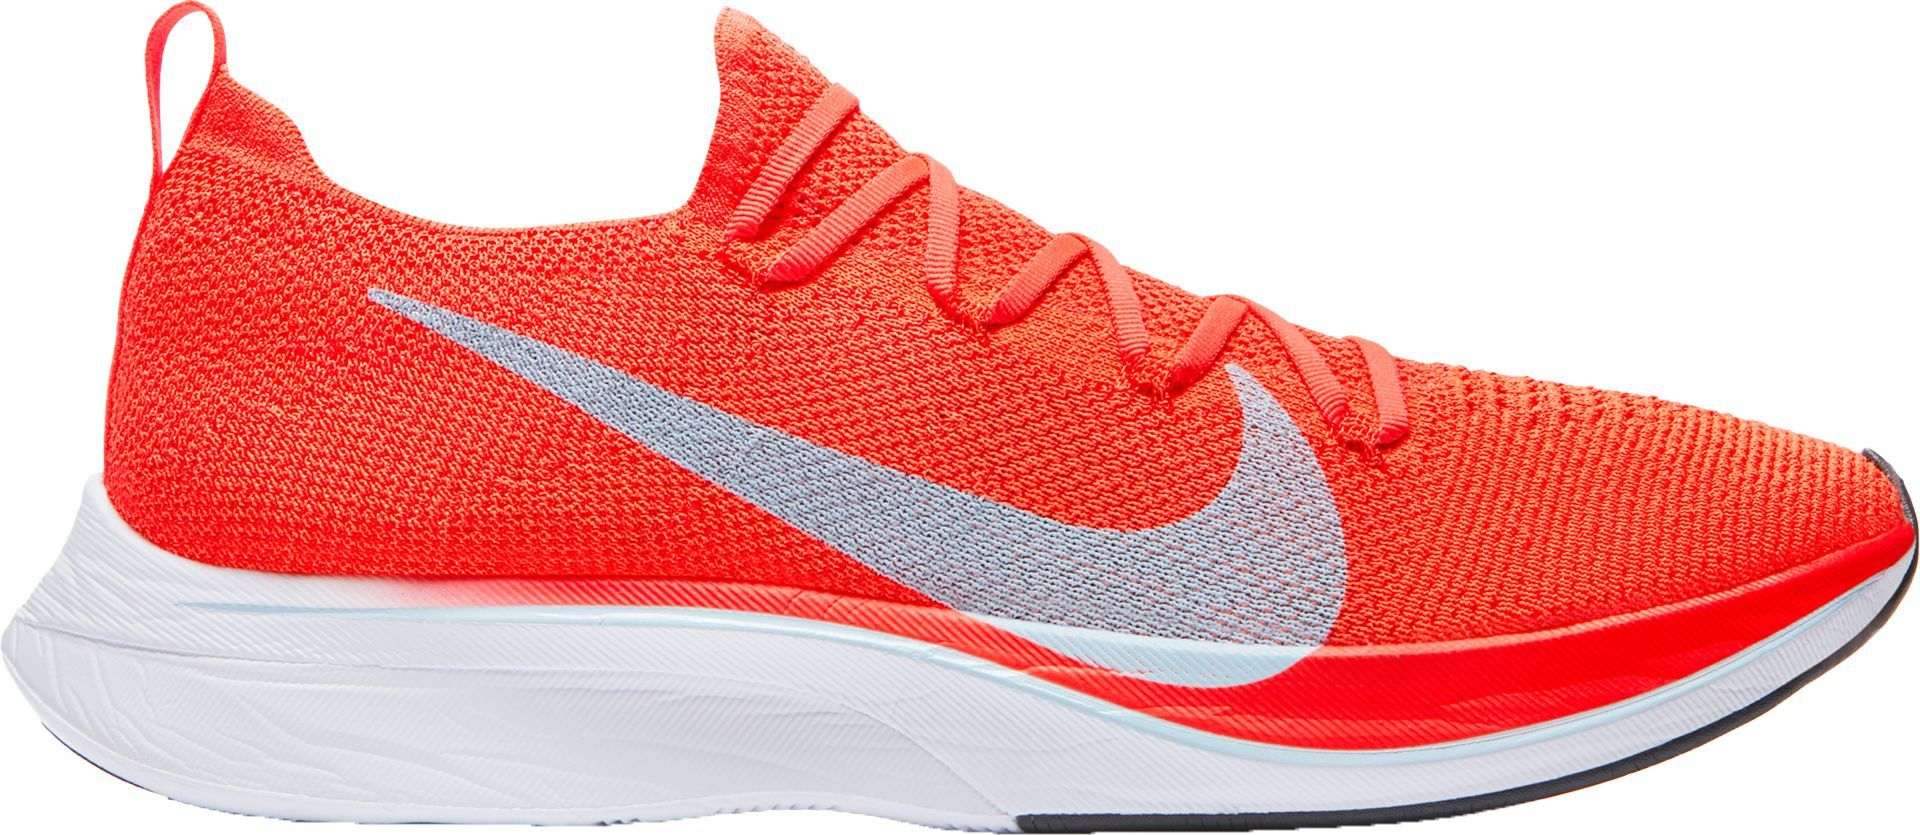 ed9493951c93b Nike VaporFly 4% Flyknit Running Shoes